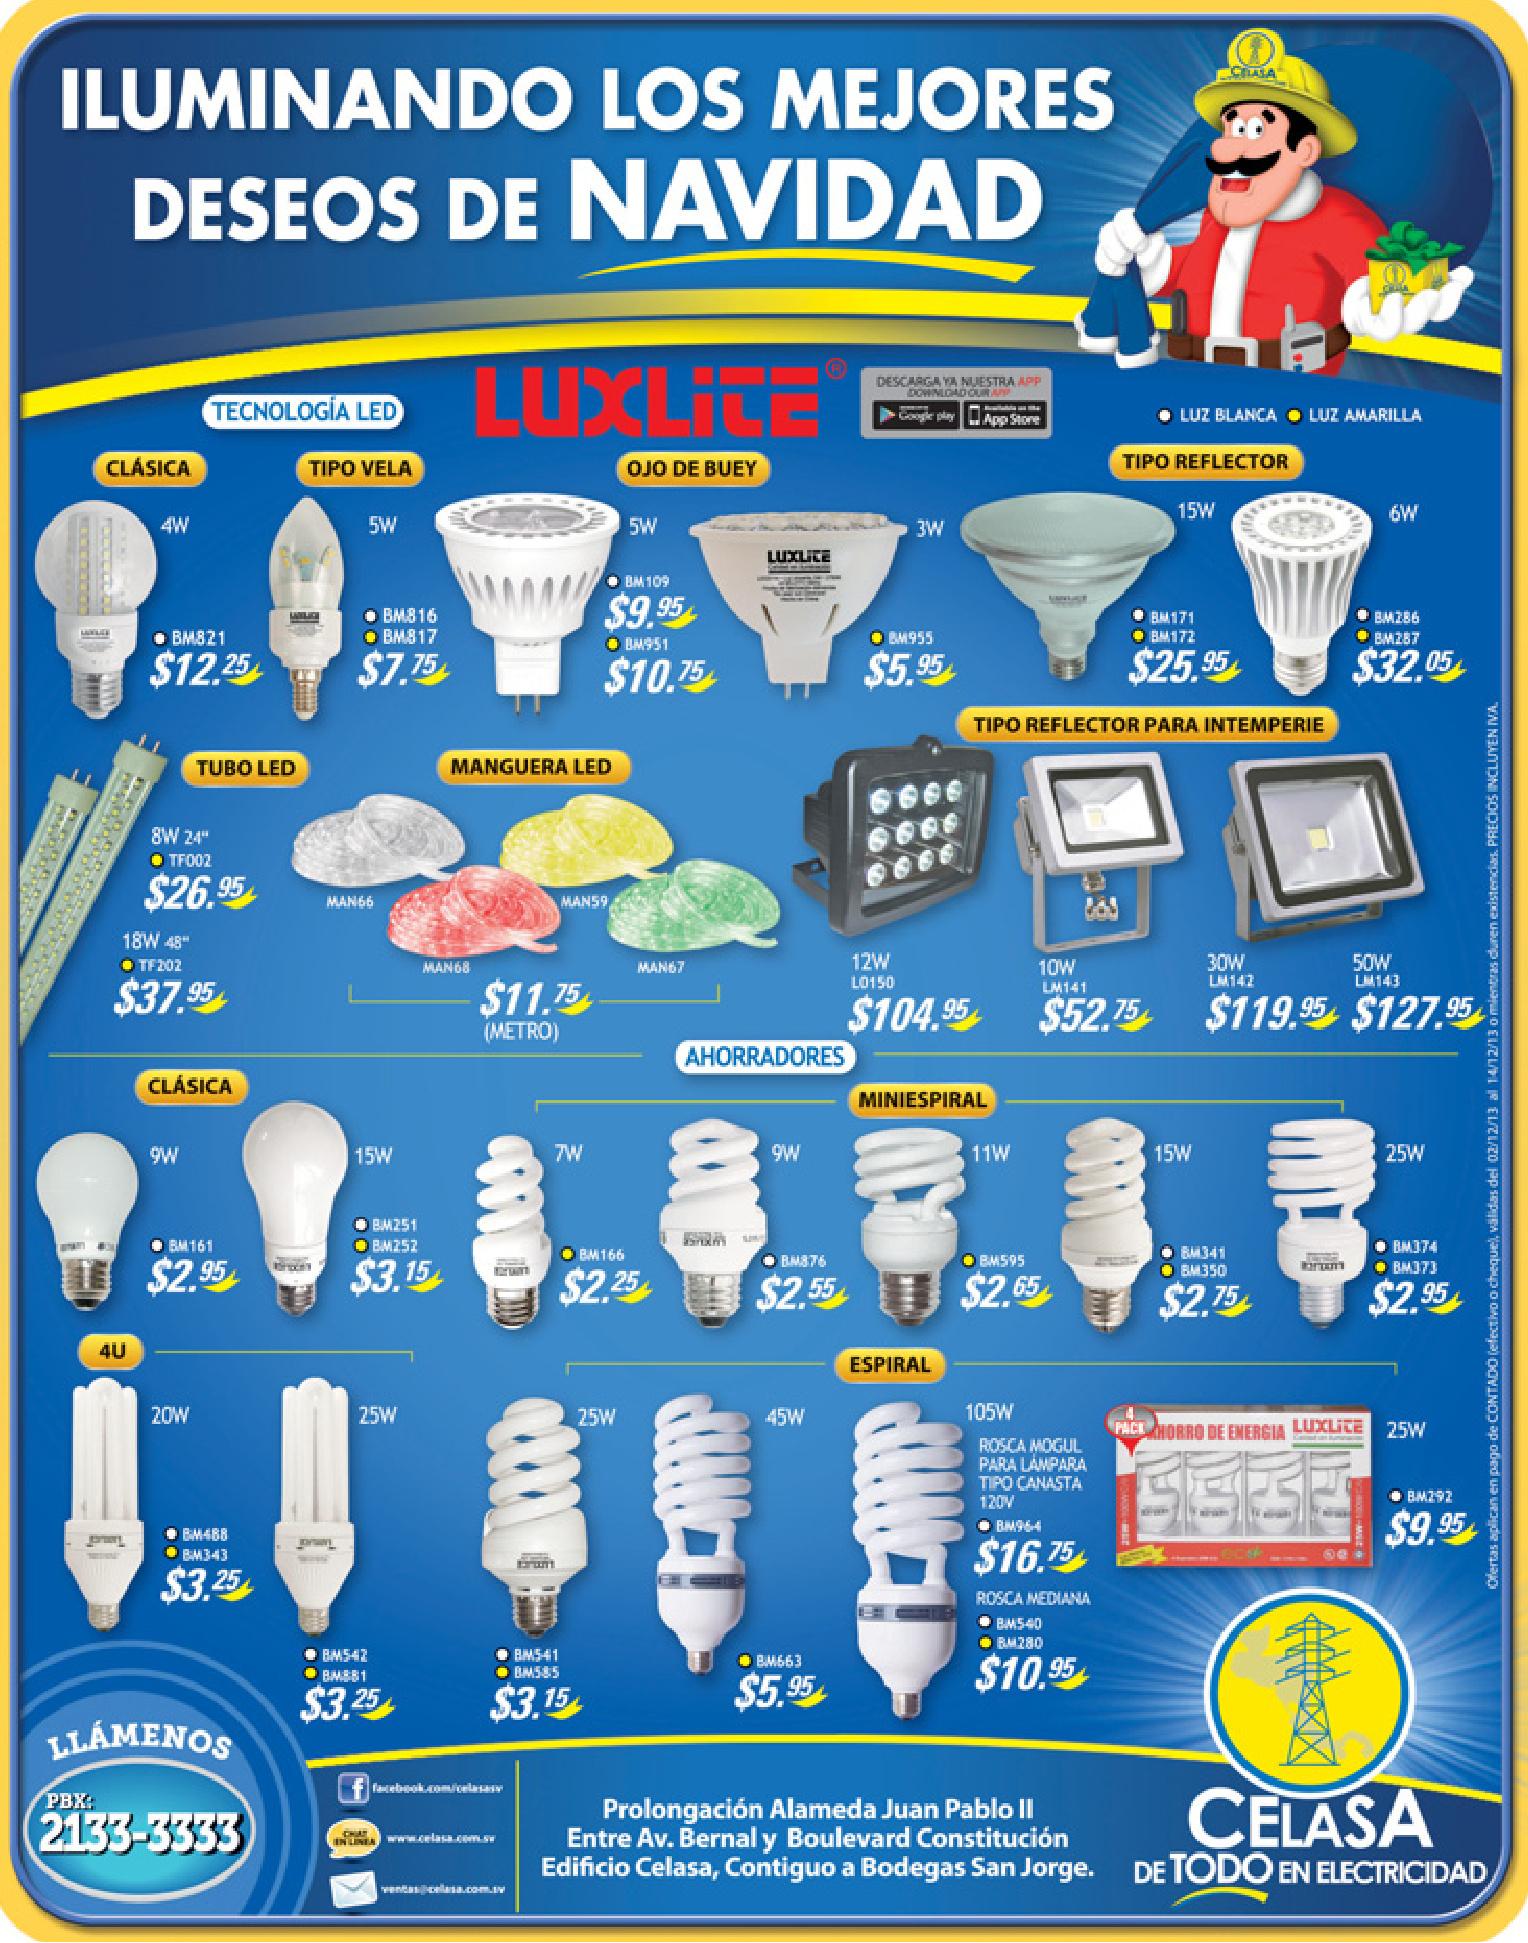 Ferreteria CELASA descuentos electricos - 02dic13